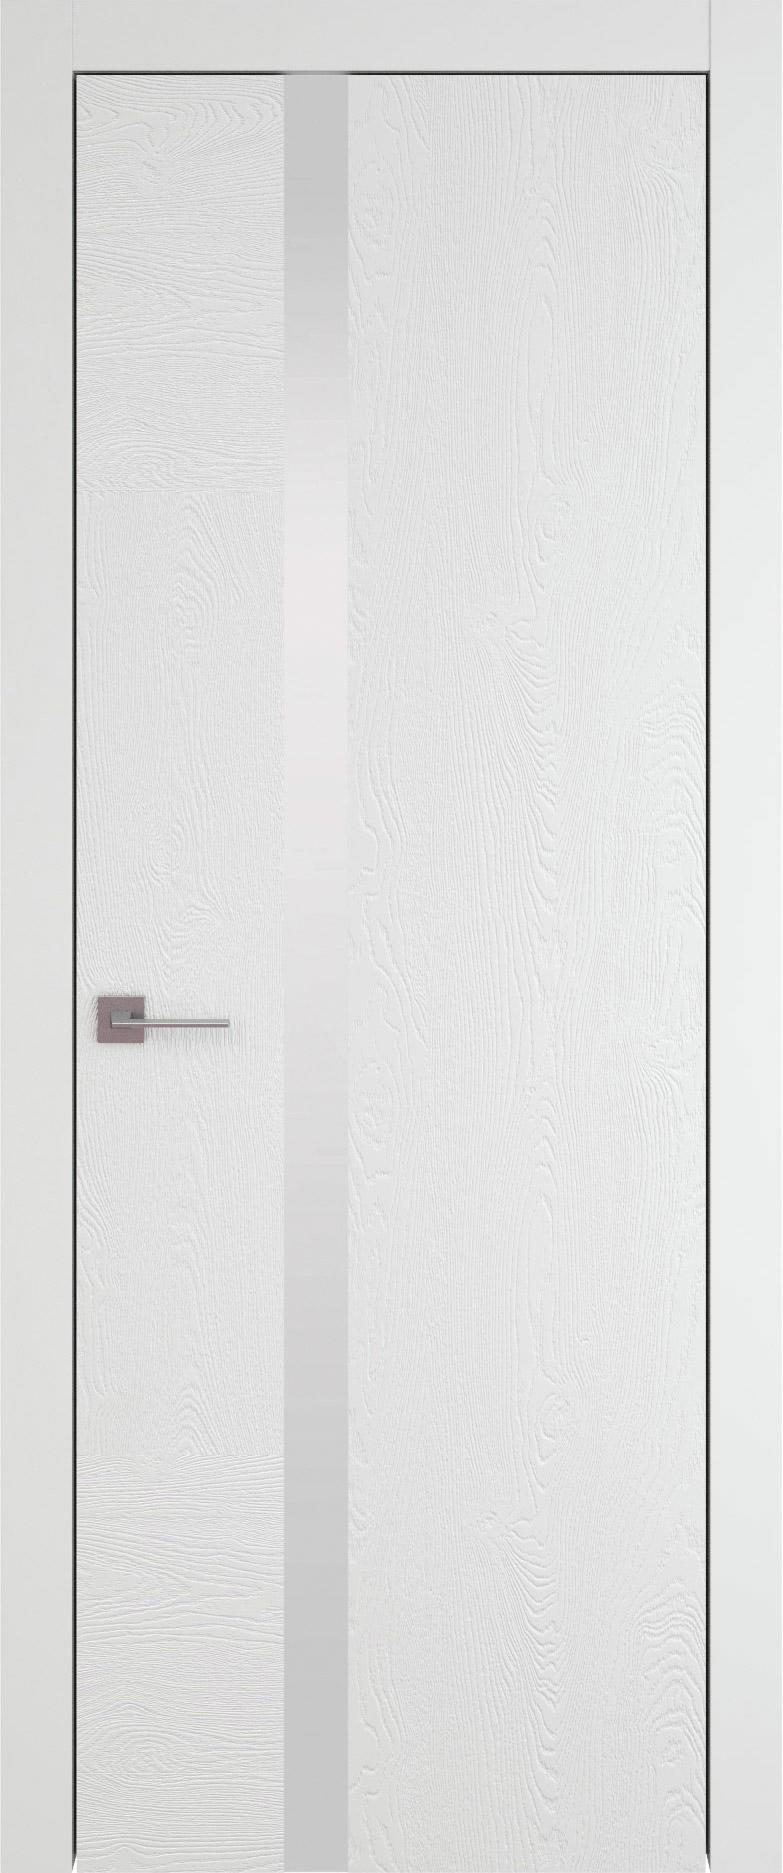 Tivoli Д-1 цвет - Белая эмаль по шпону (RAL 9003) Без стекла (ДГ)